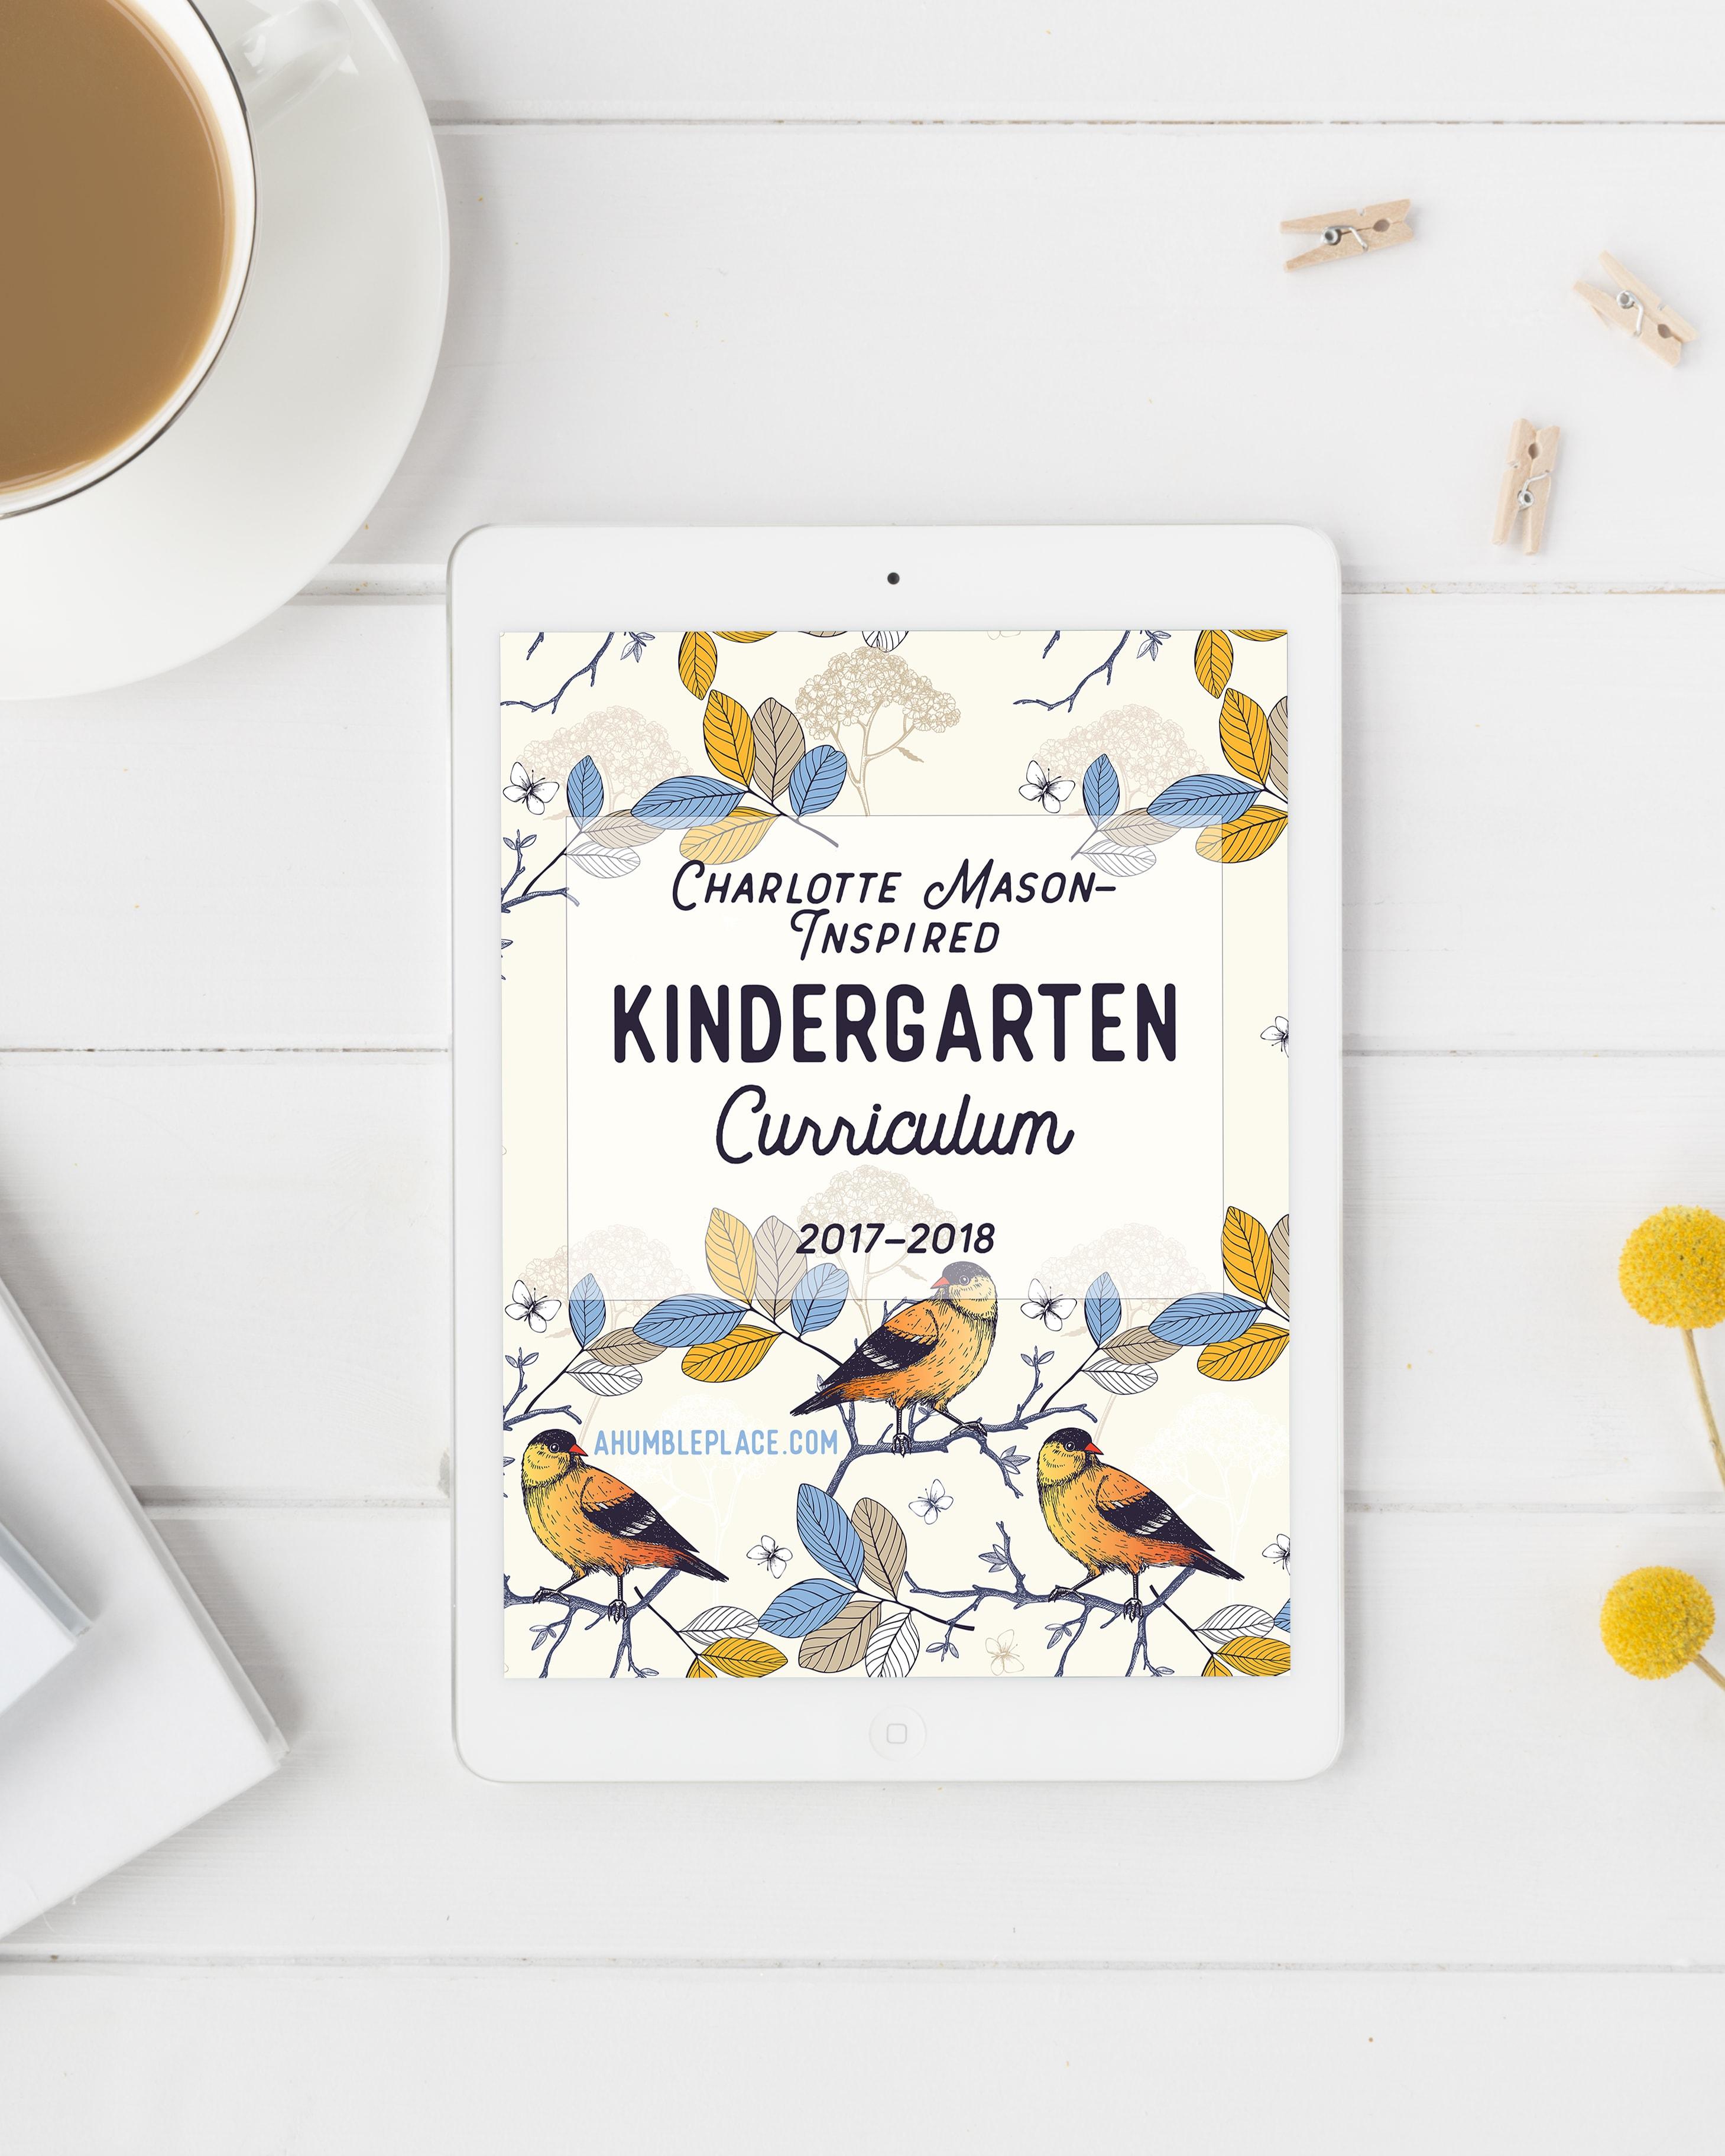 Charlotte Mason Inspired Kindergarten Curriculum Version A Humble Place